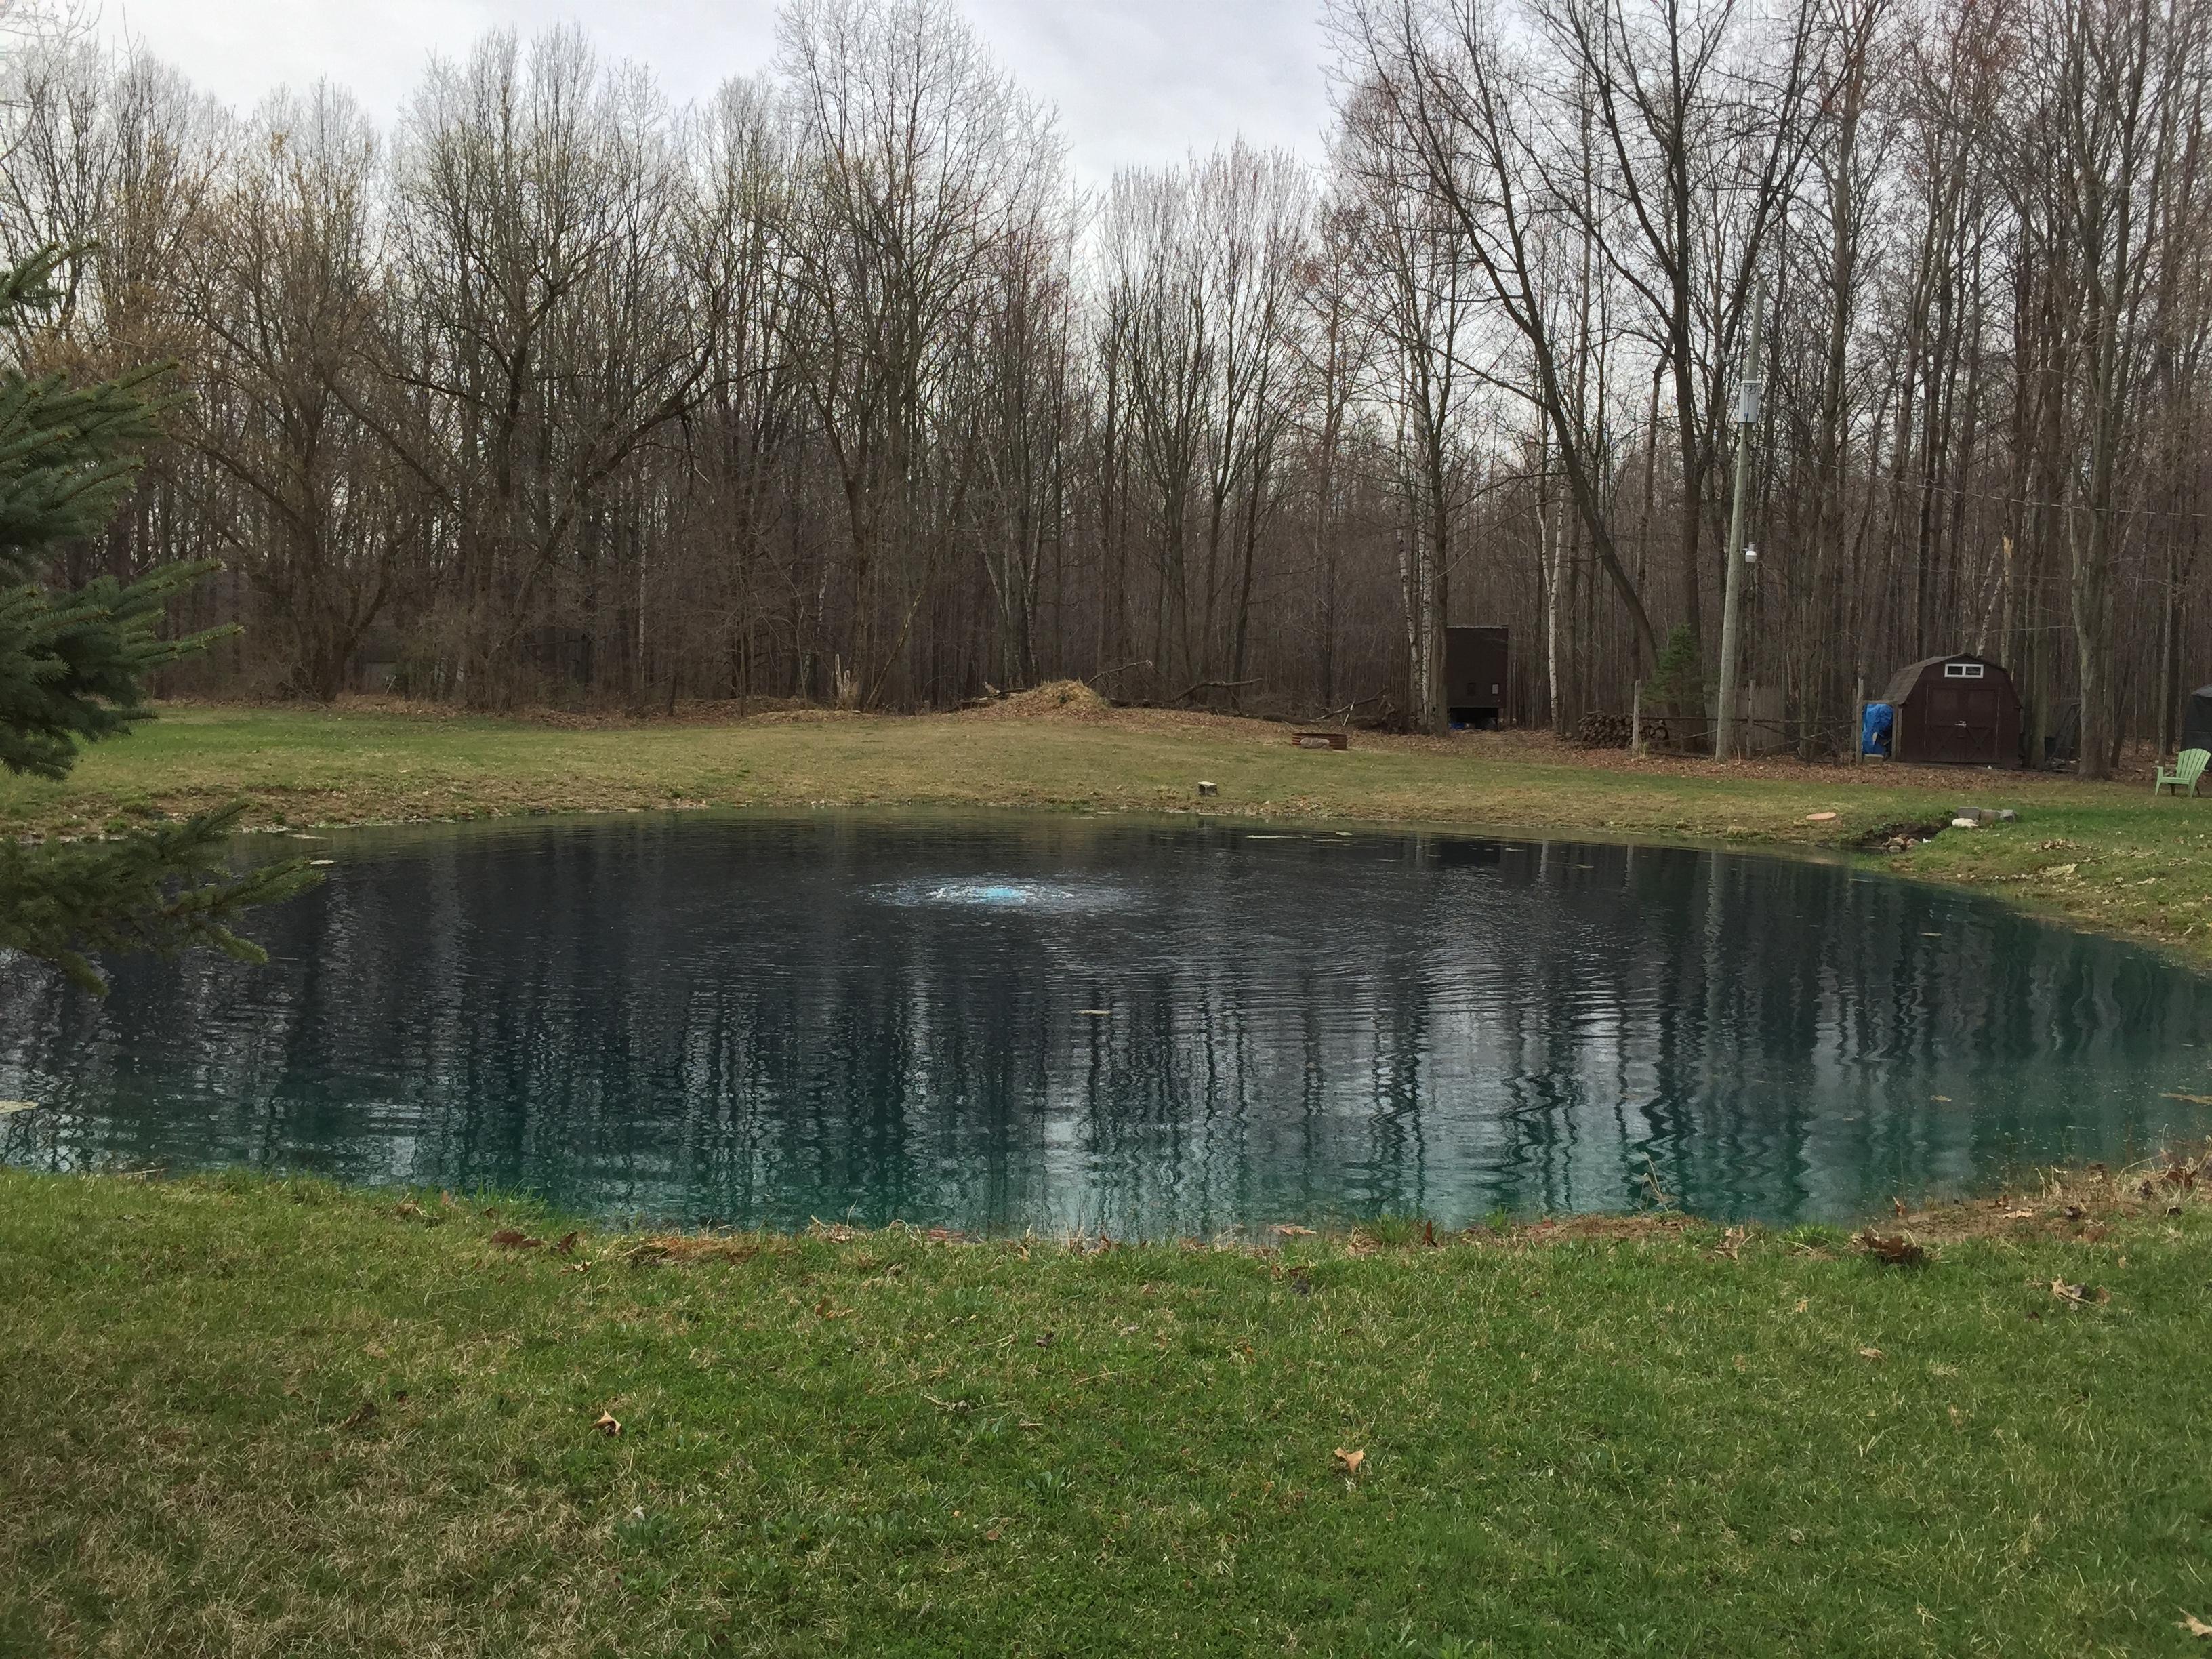 Pond_expansion_Michigan_Genesee_County_MI_____________________2.jpg